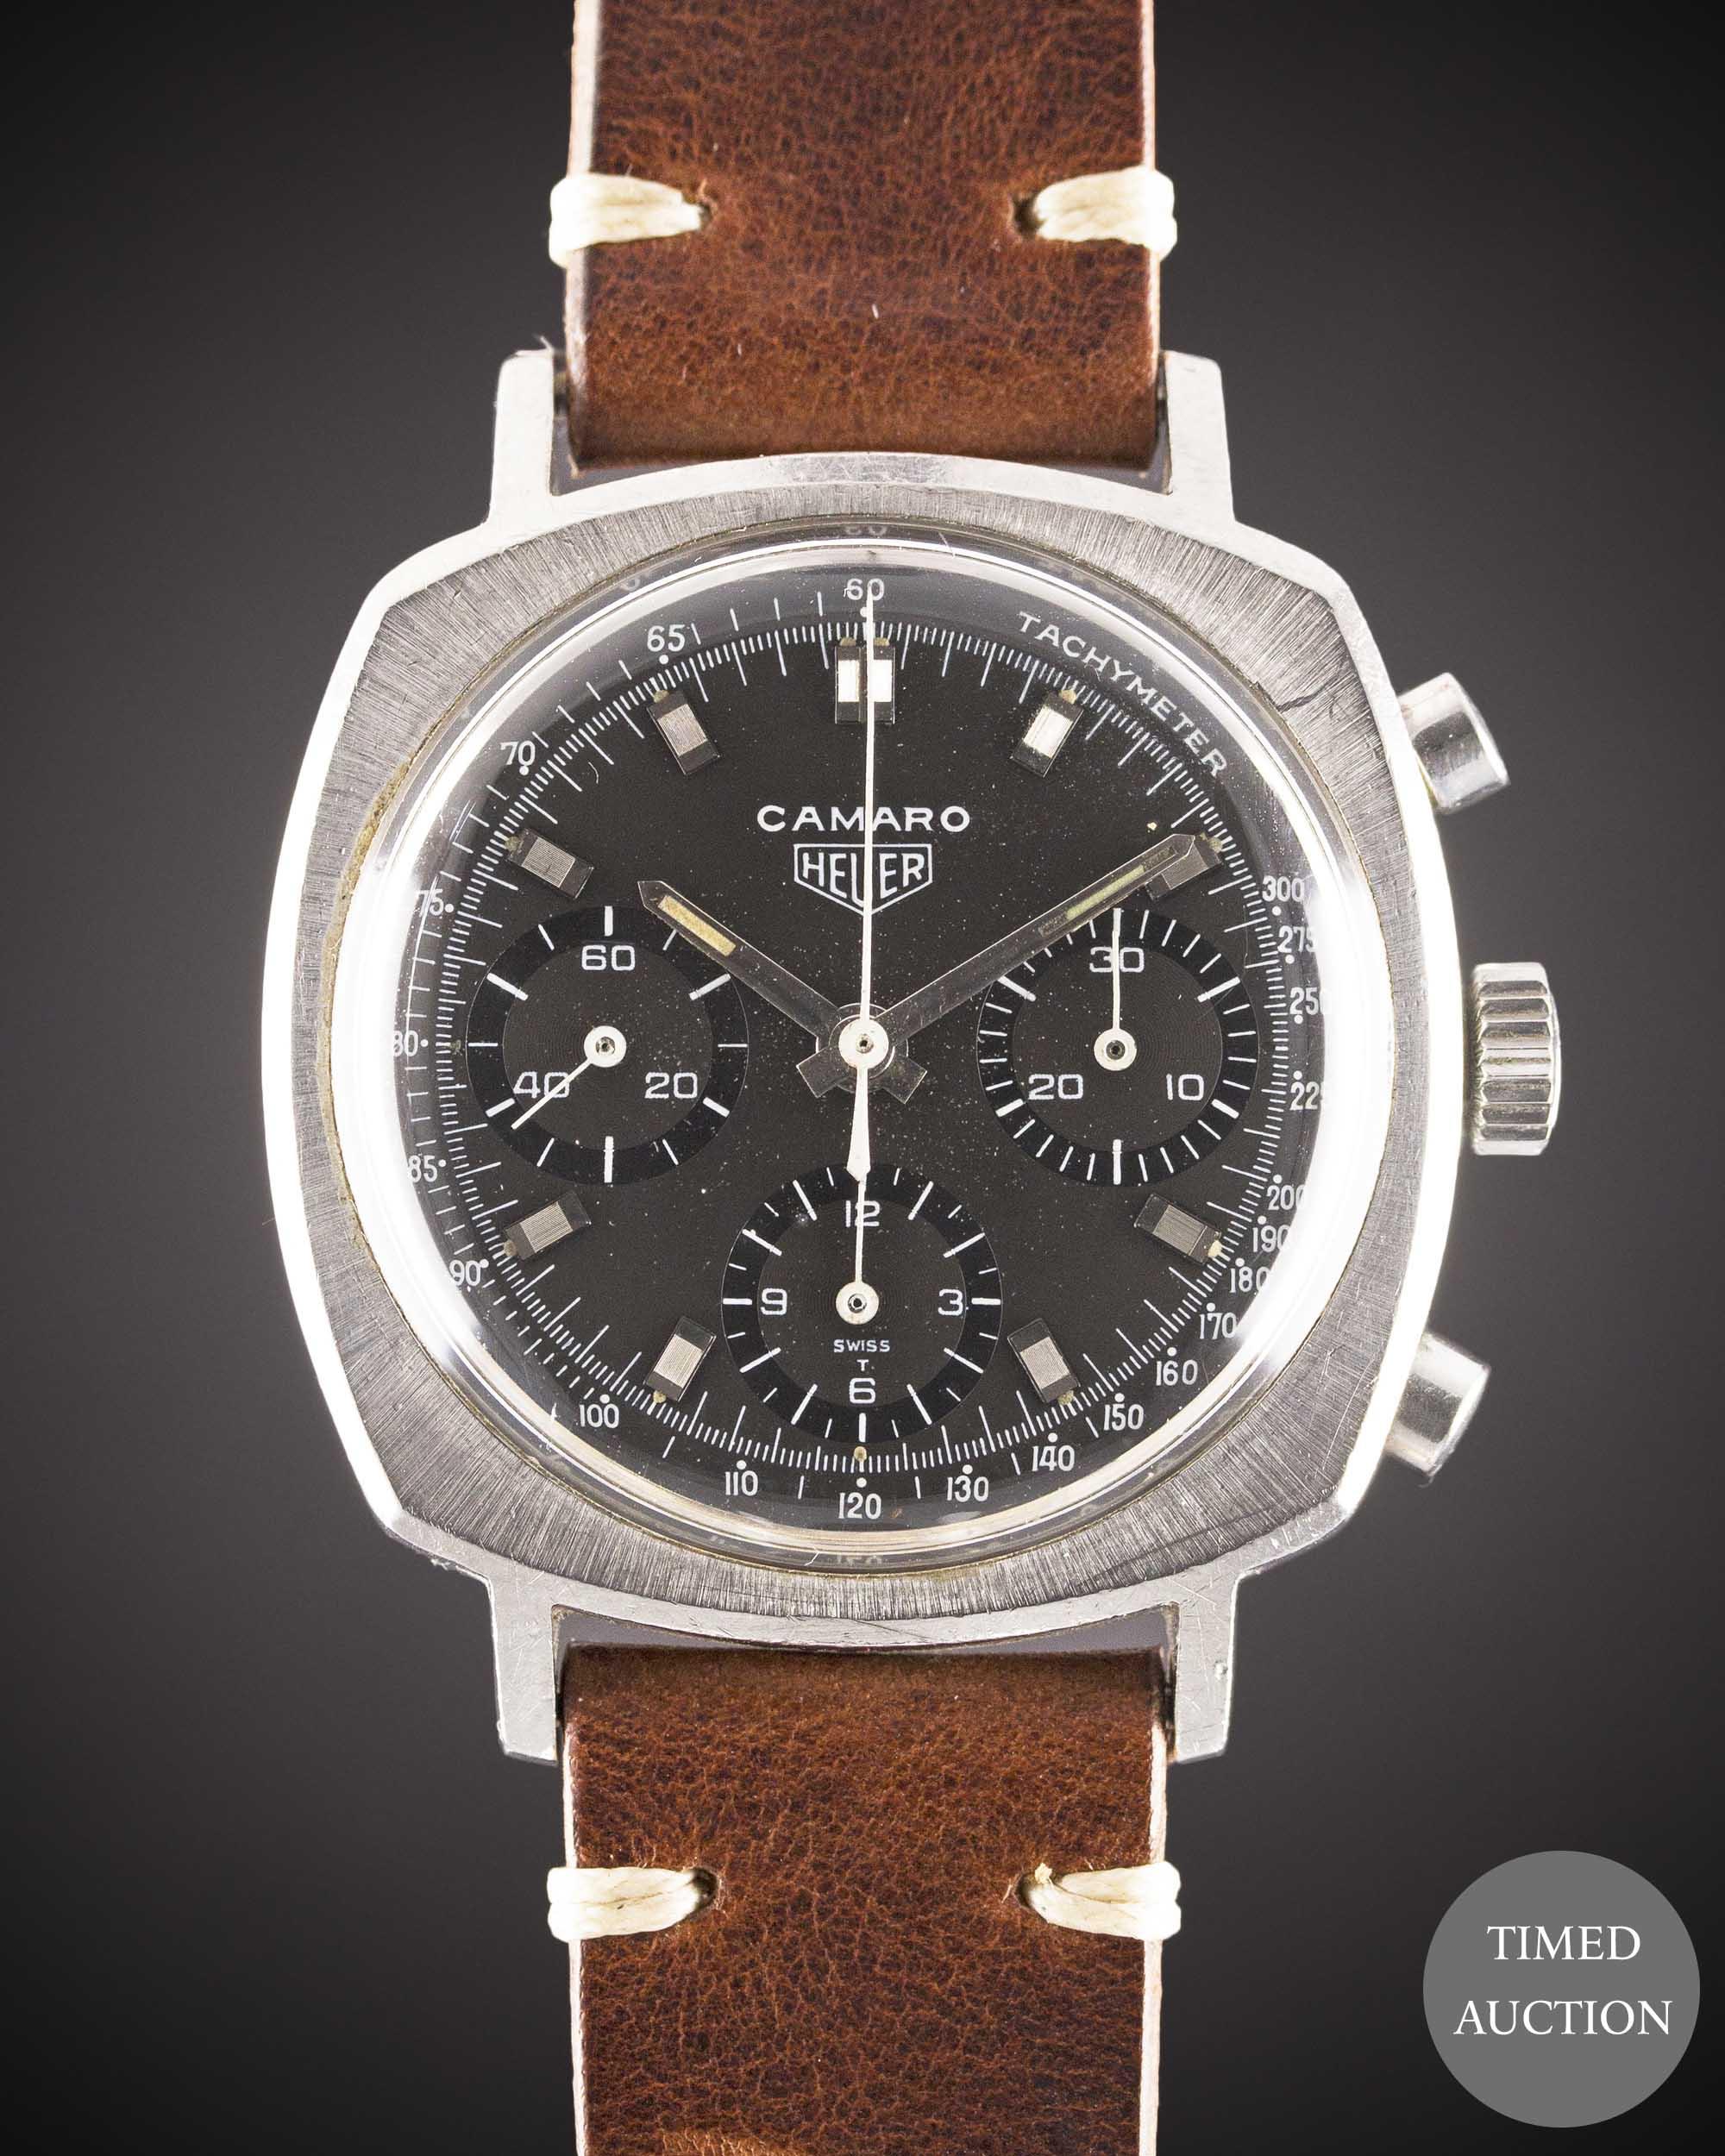 Lot 28 - A GENTLEMAN'S STAINLESS STEEL HEUER CAMARO CHRONOGRAPH WRIST WATCH CIRCA 1970, REF. 7220NT WITH